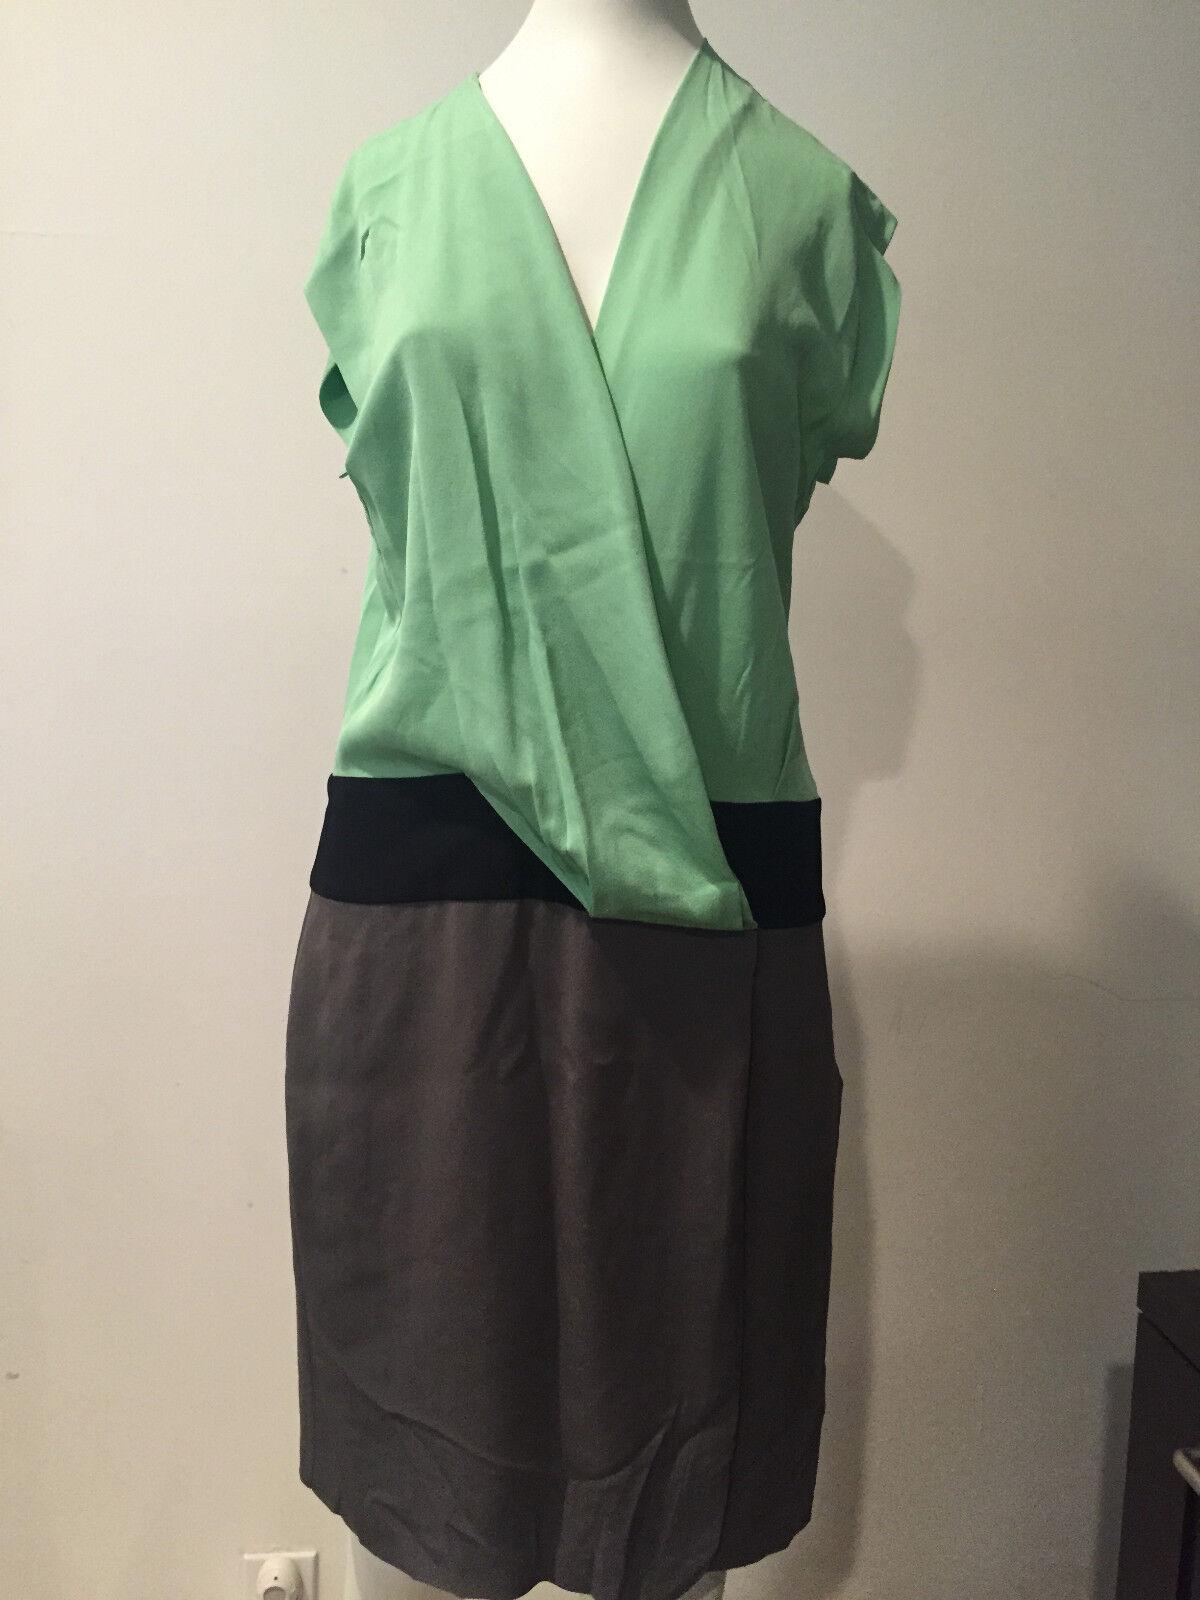 Preowned  DVF Diane Von Furstenberg Nori Crepe Dress    Size 6    MG